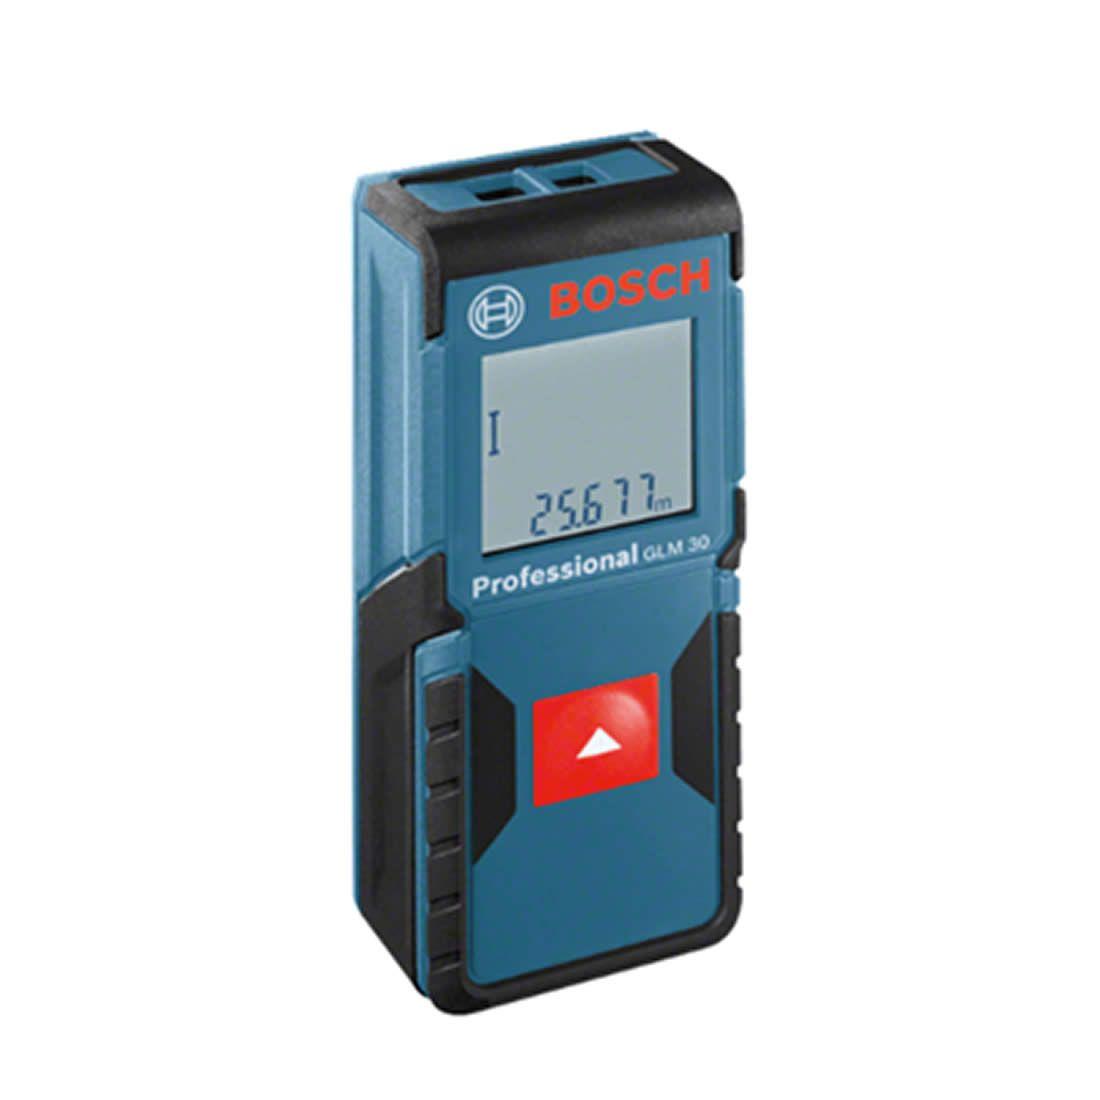 Trena a Laser Bosch Profissional GLM 30